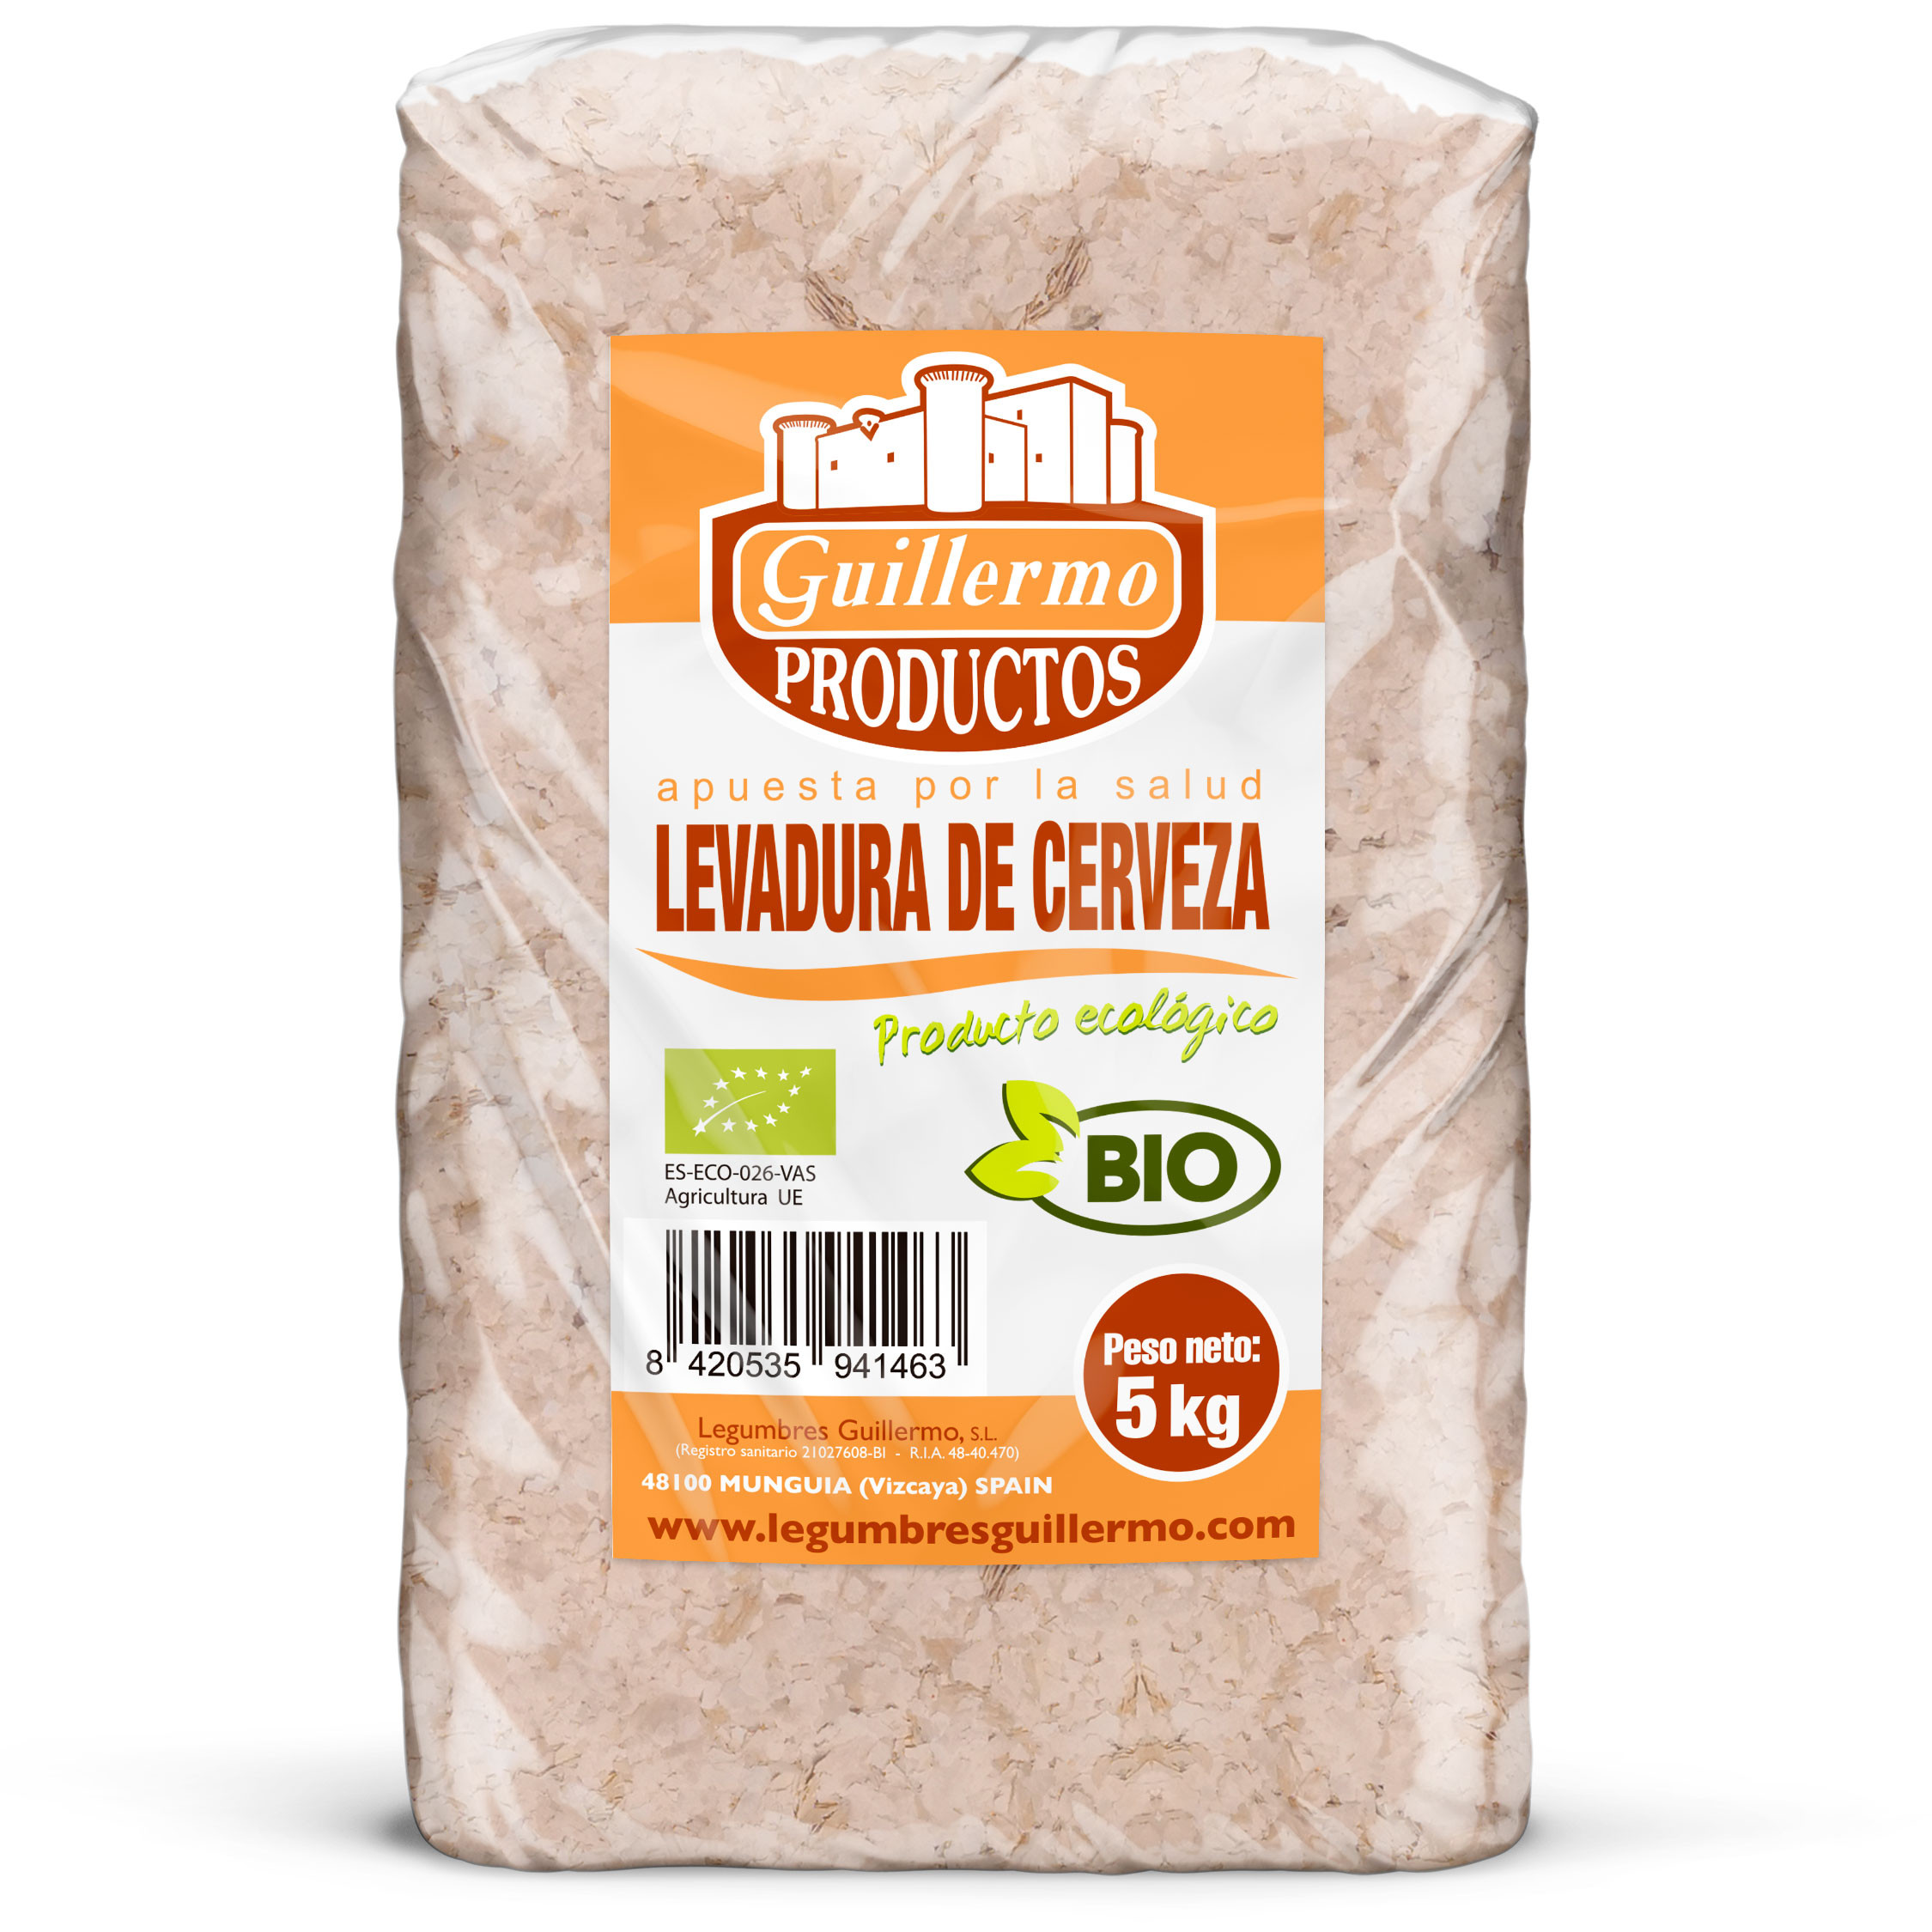 Guillermo Horeca Levadura de Cerveza Ecológica BIO Granel 5kg